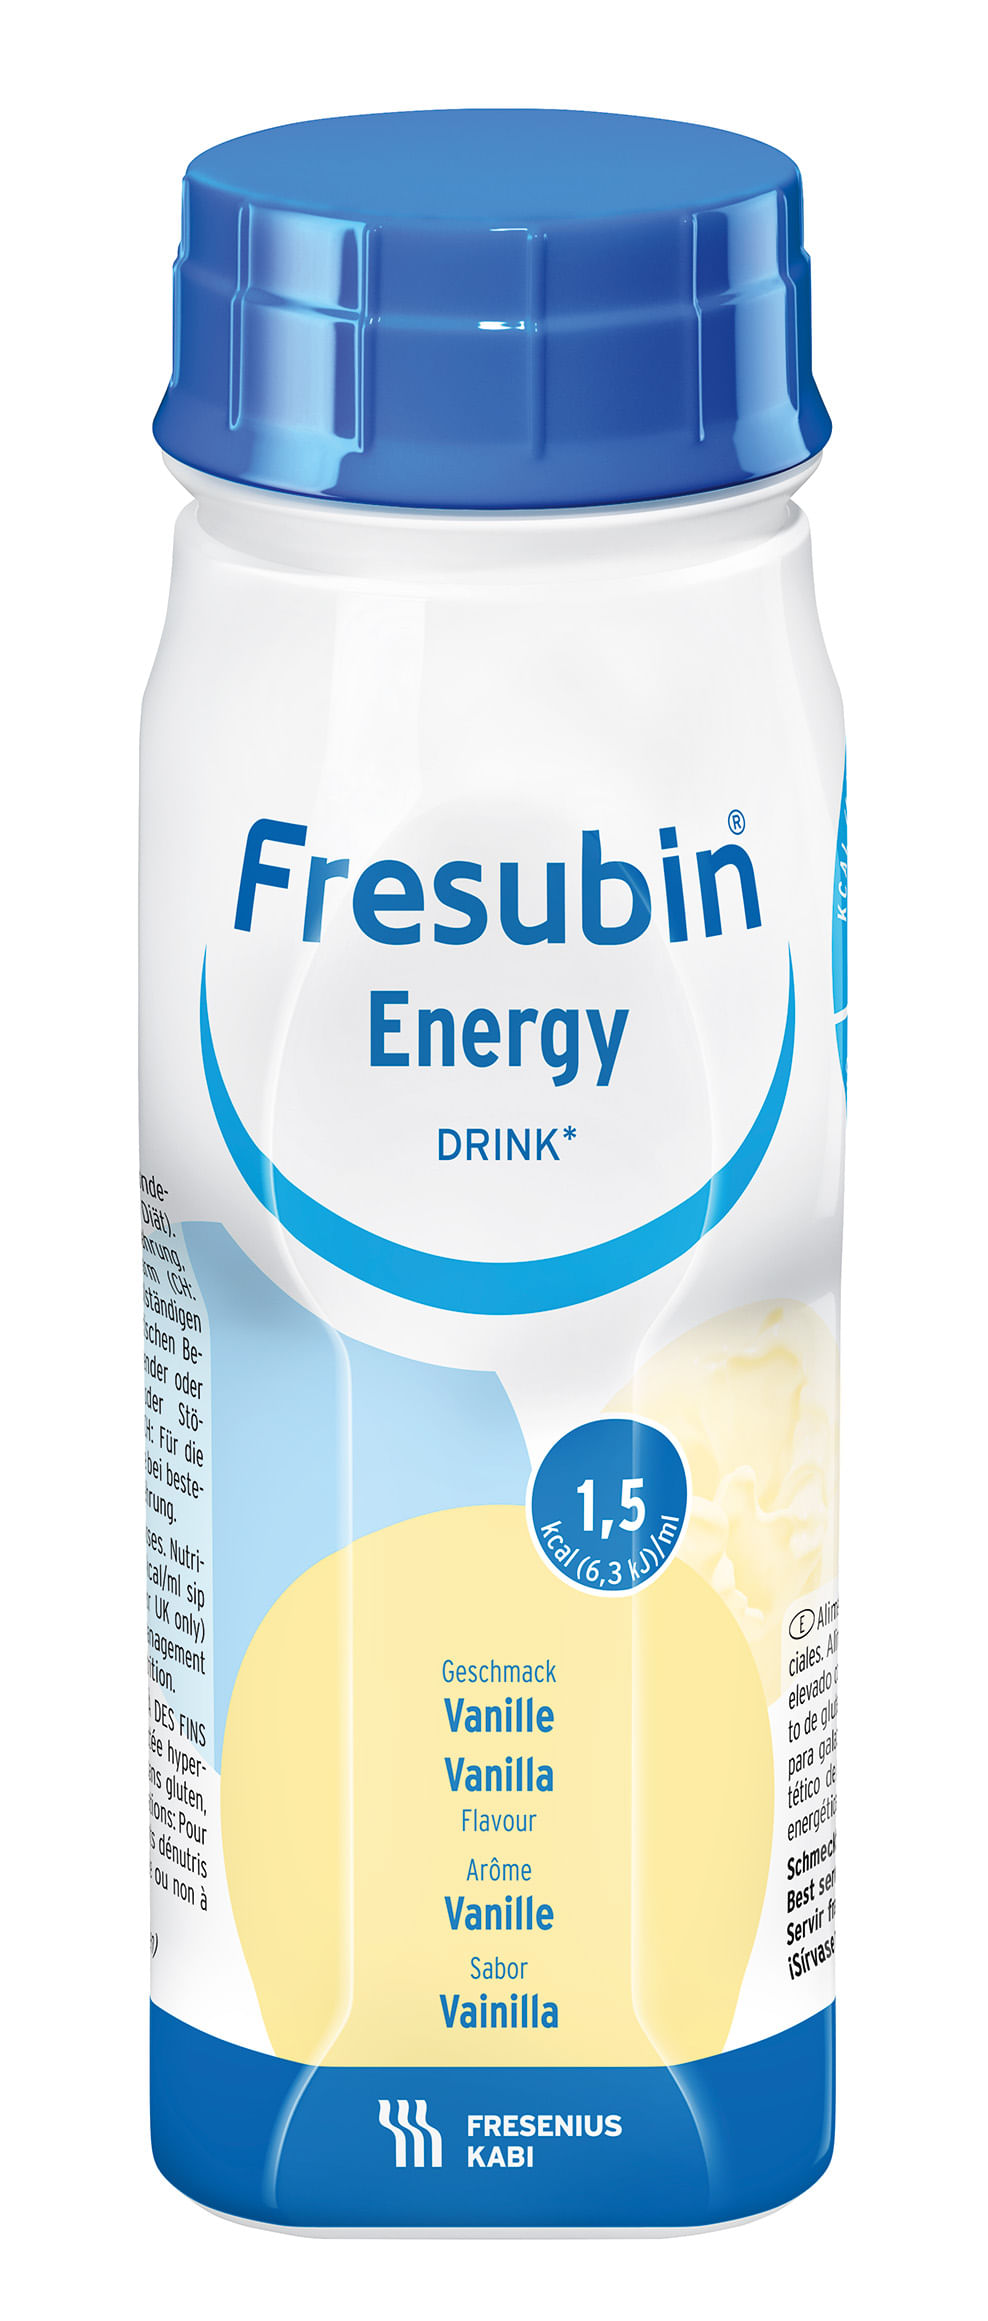 Fresubin_Energy_Vanilla_EBo_Frontal